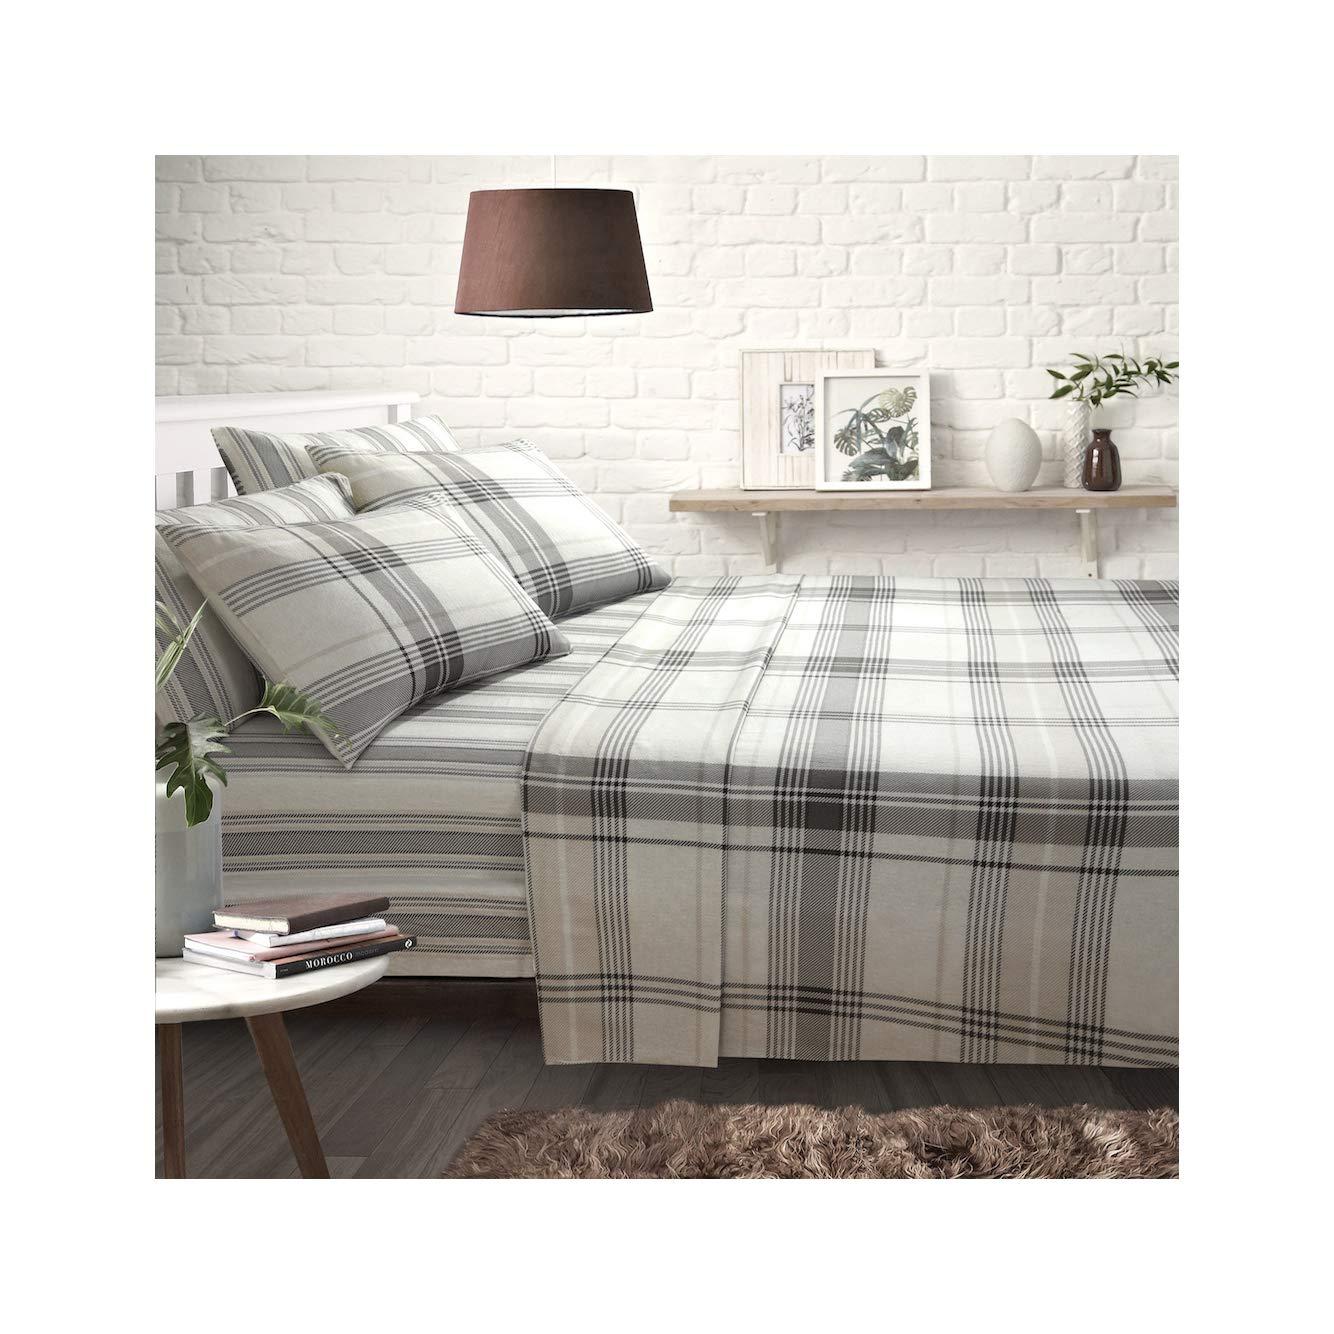 Natural, Single   Includes Fitted Sheet ShawsDirect Burlington Check 100/% Pure Brushed Cotton Sheet Set Flat Sheet /& Pillowcase s